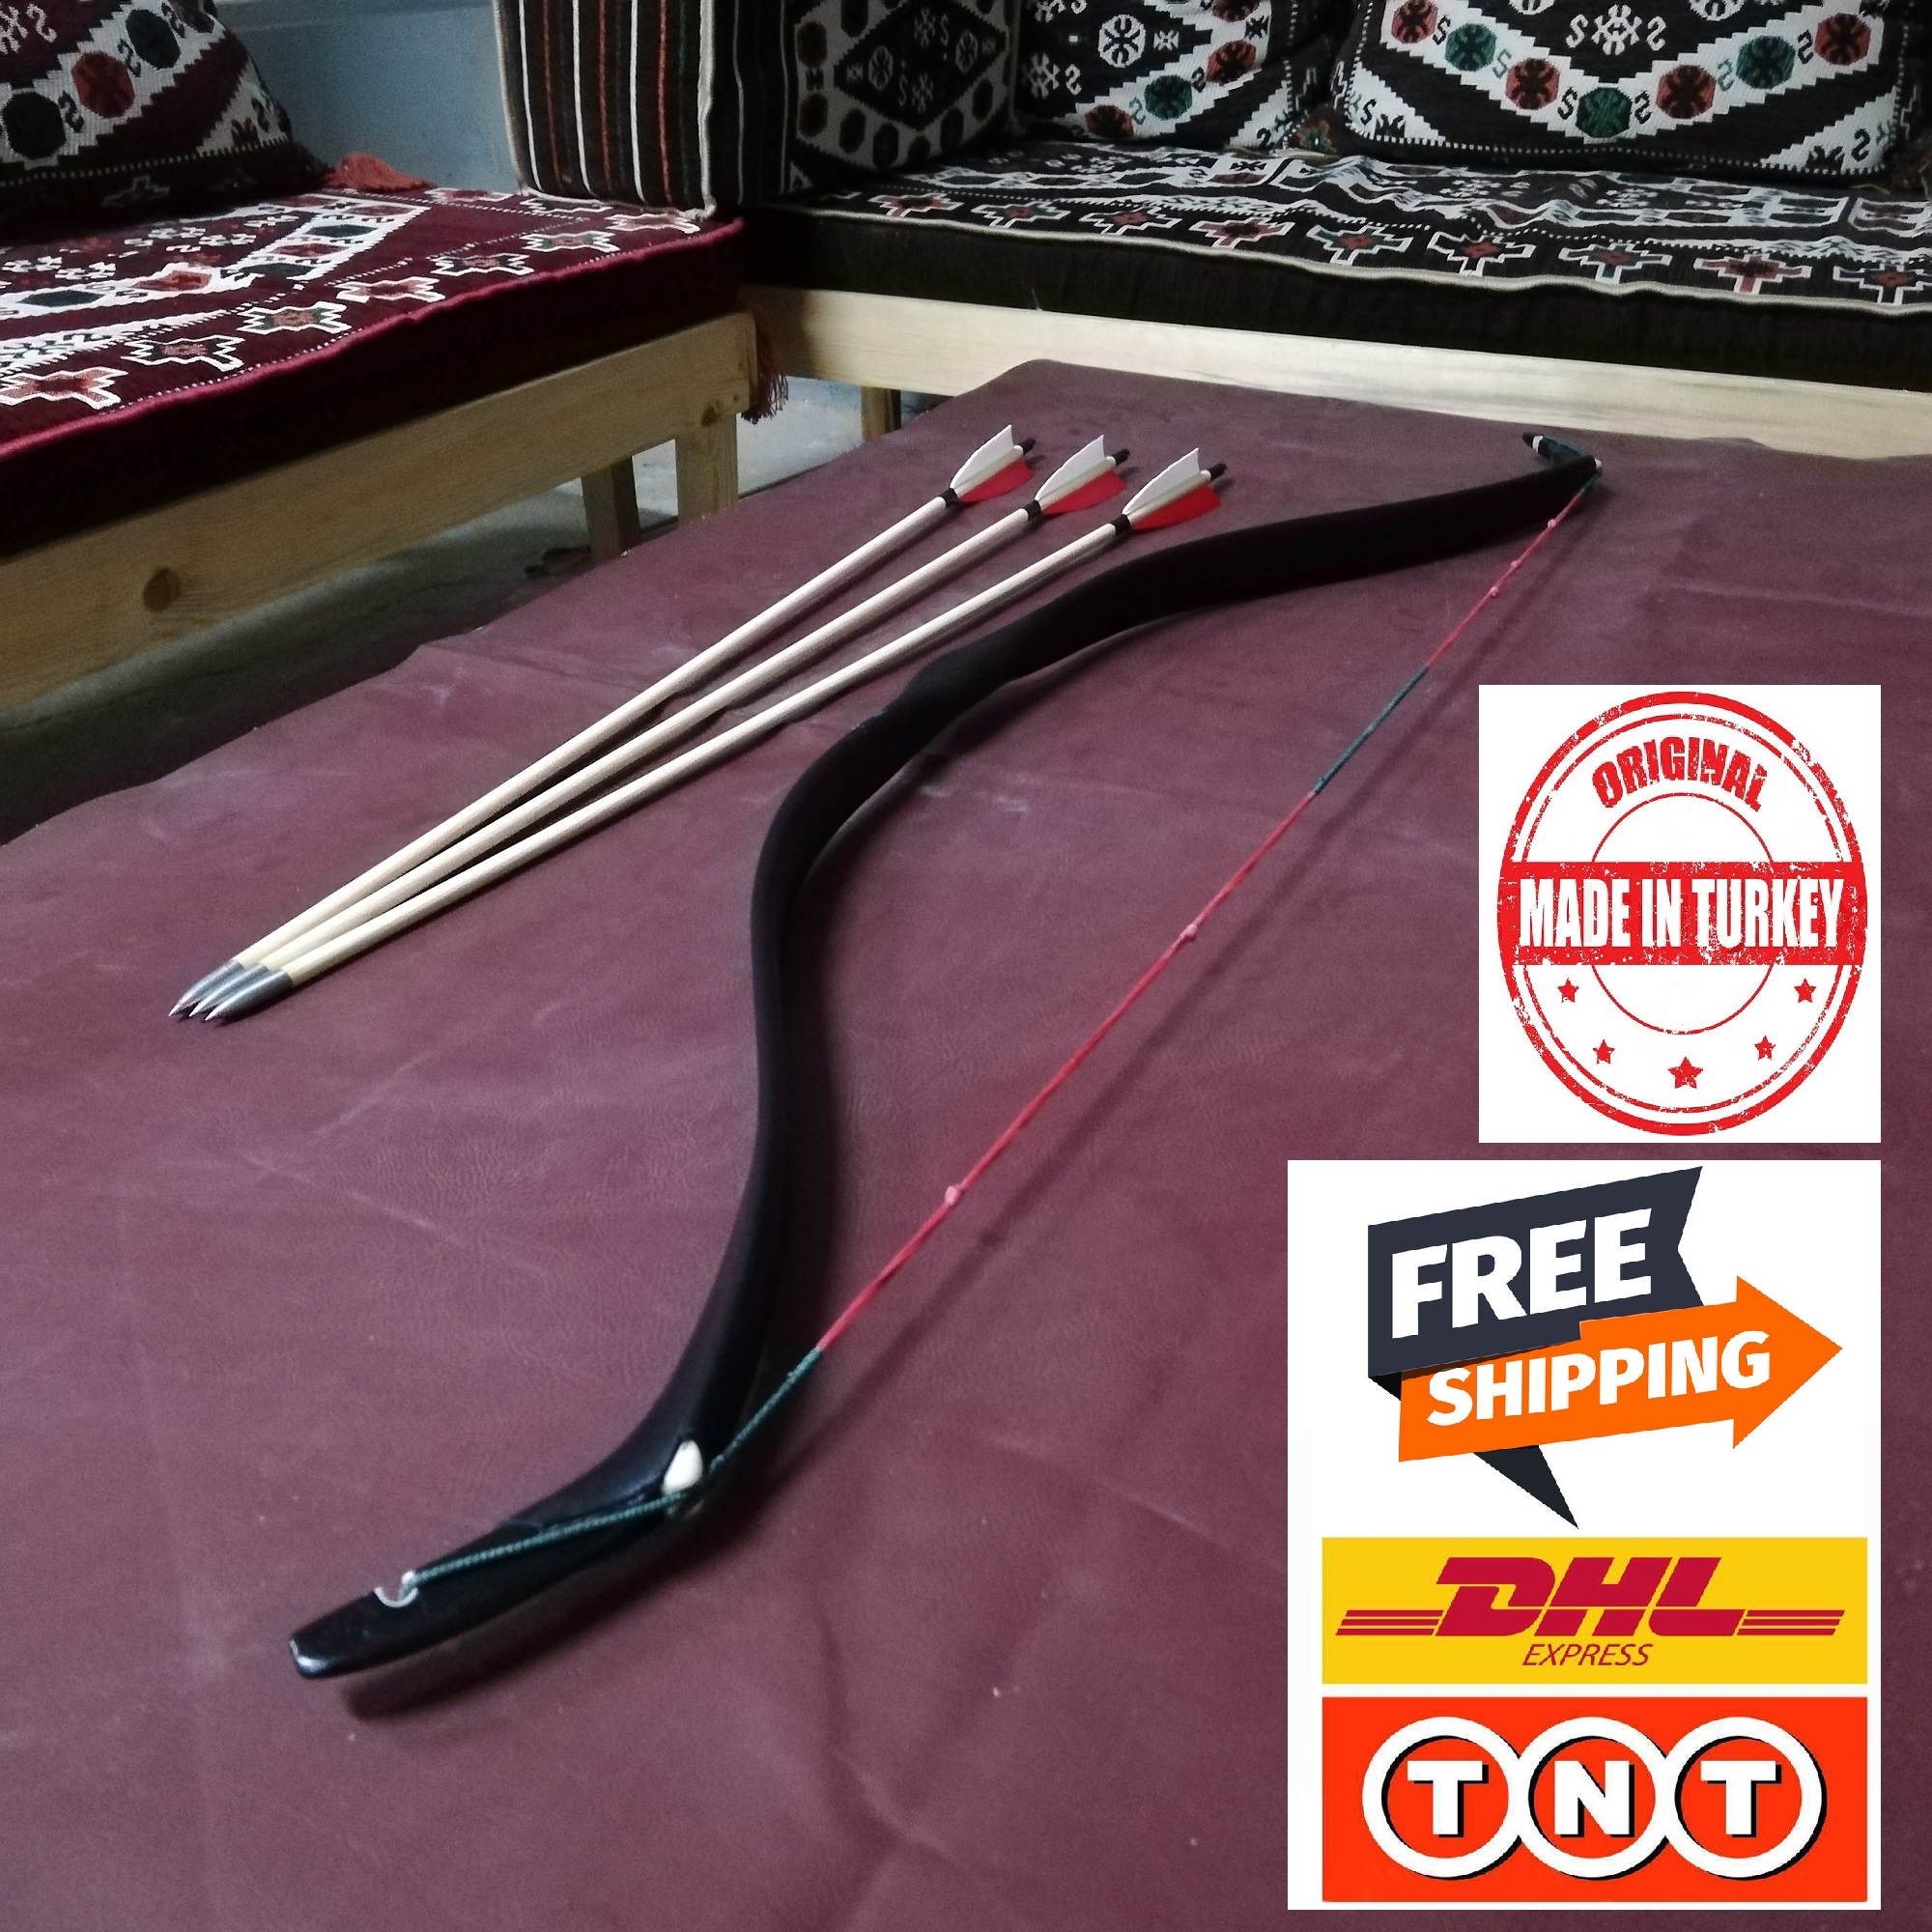 Okcubaba premium turco tradicional pv resina de fibra de vidro arco alvo tiro 30-45 libras turco forma otomano-frete grátis dhl/tnt